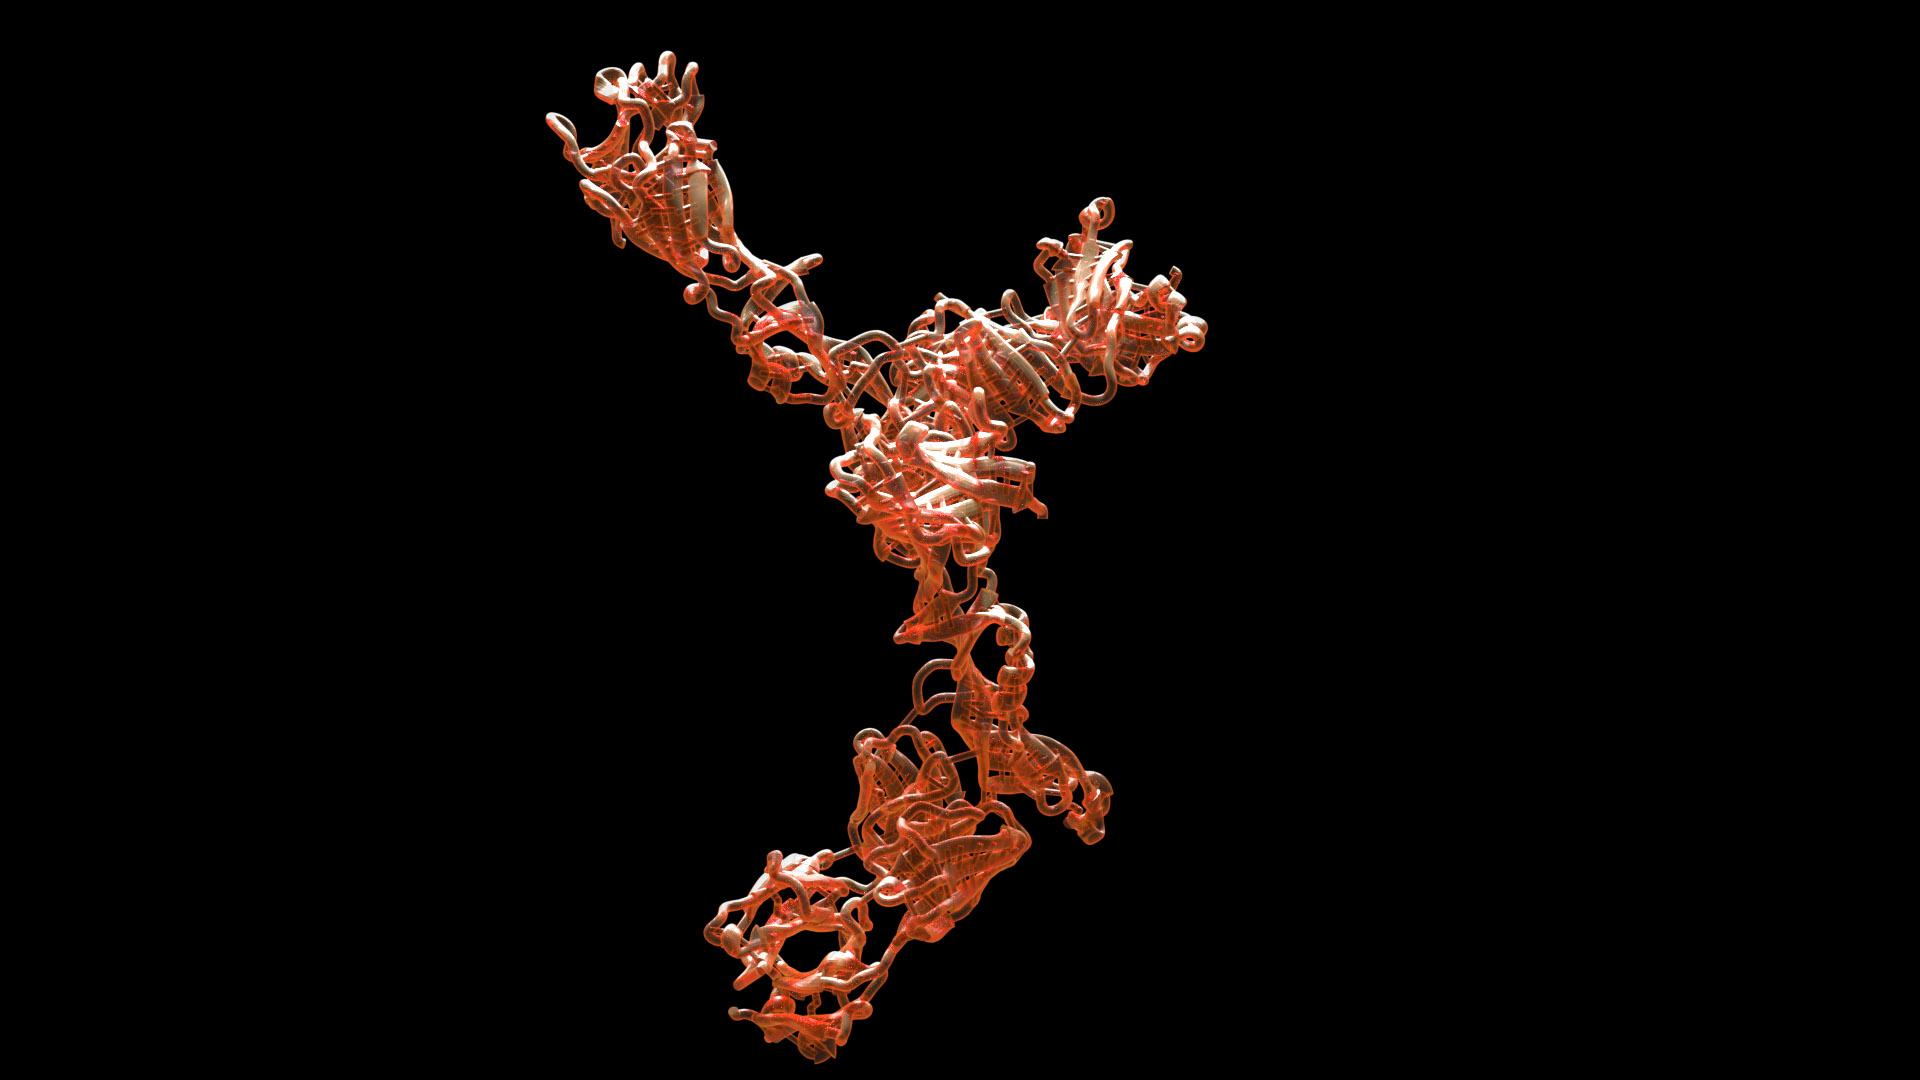 Y-antibody